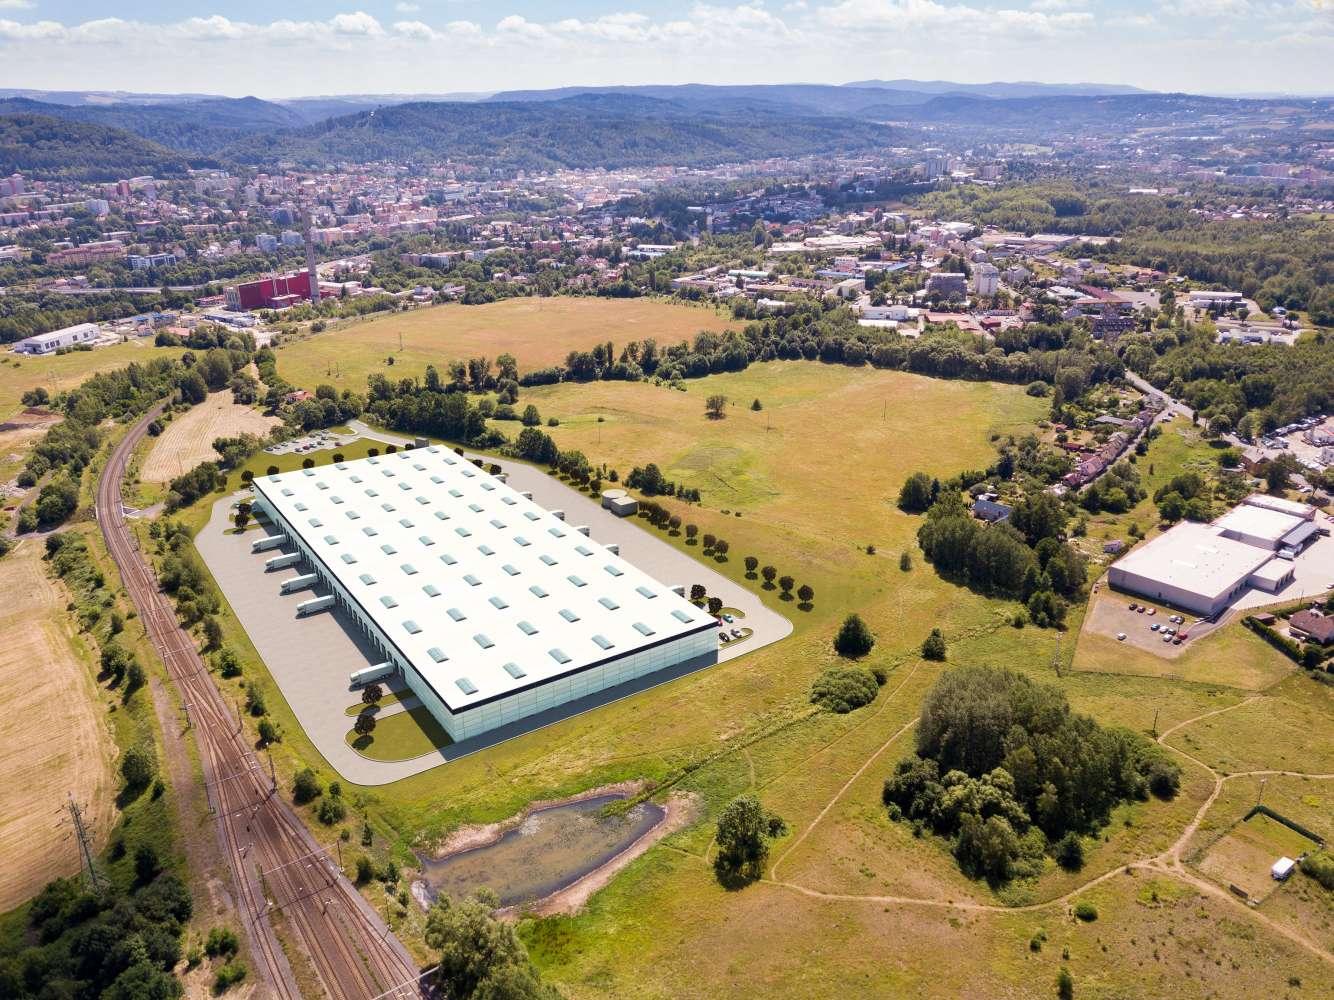 Průmyslové nemovitosti Karlovy vary,  - Panattoni Park Karlovy Vary